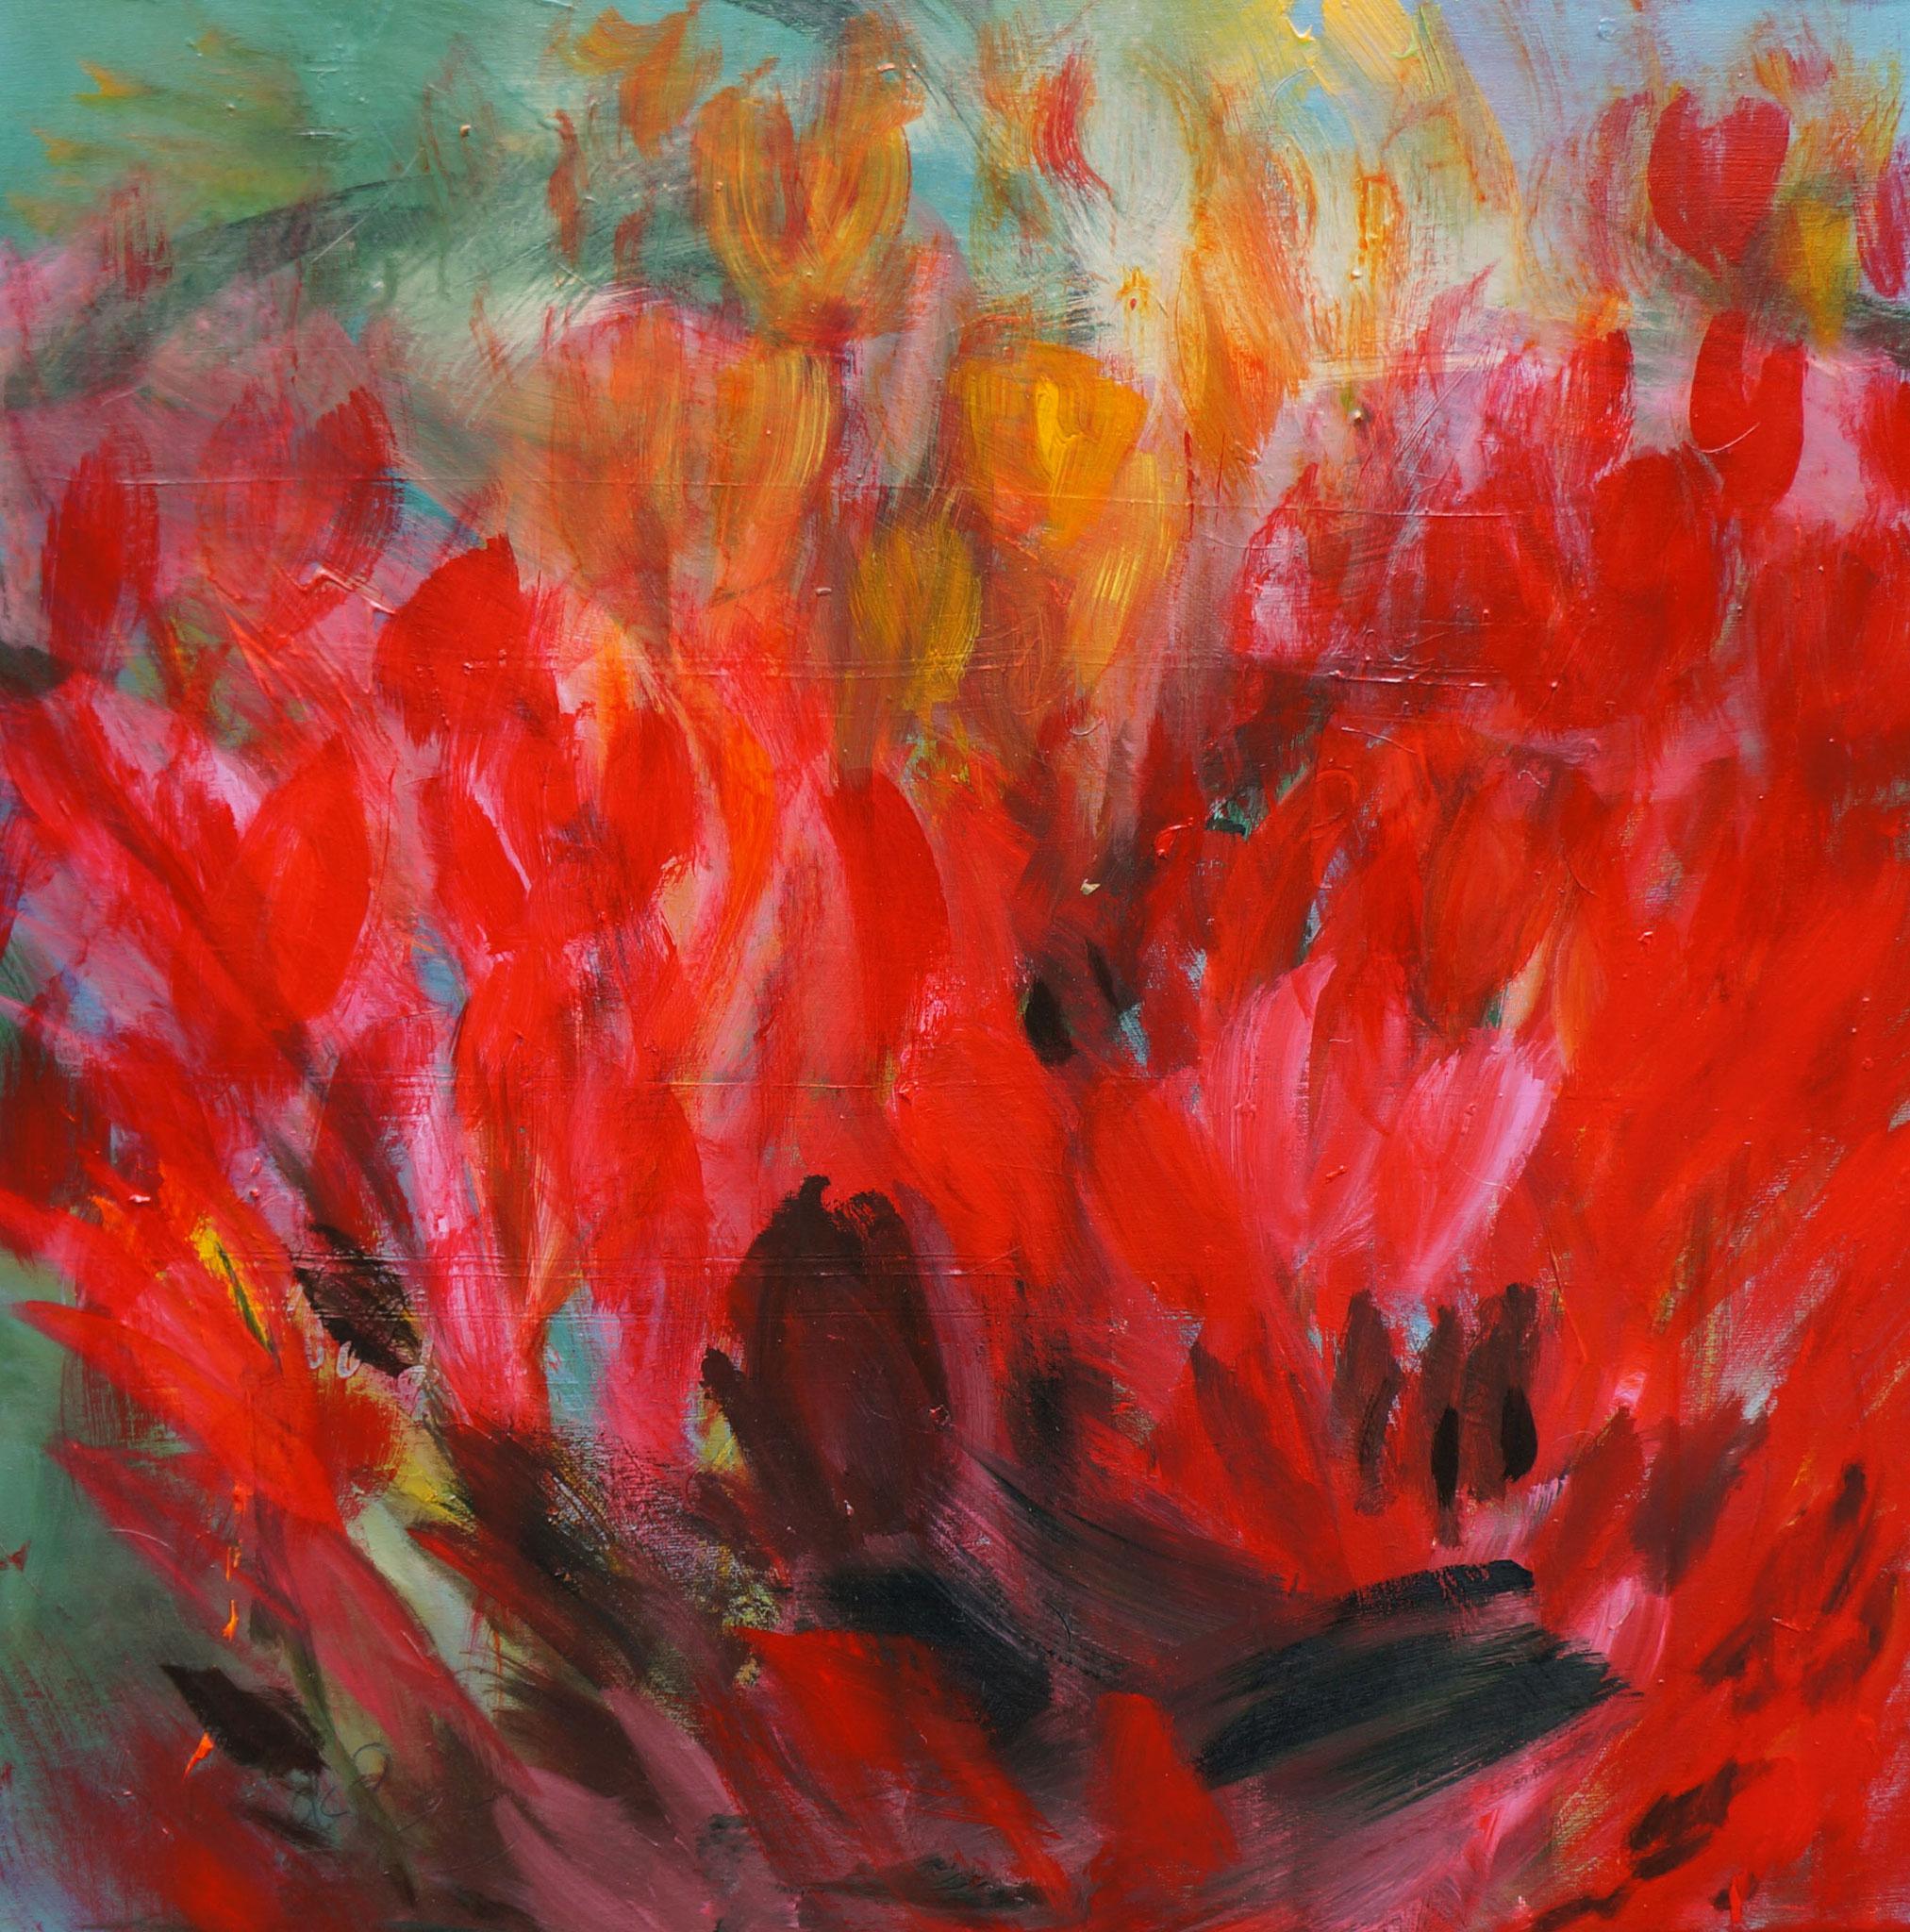 Umarmung, 80 x 80 cm, Acryl auf Leinwand